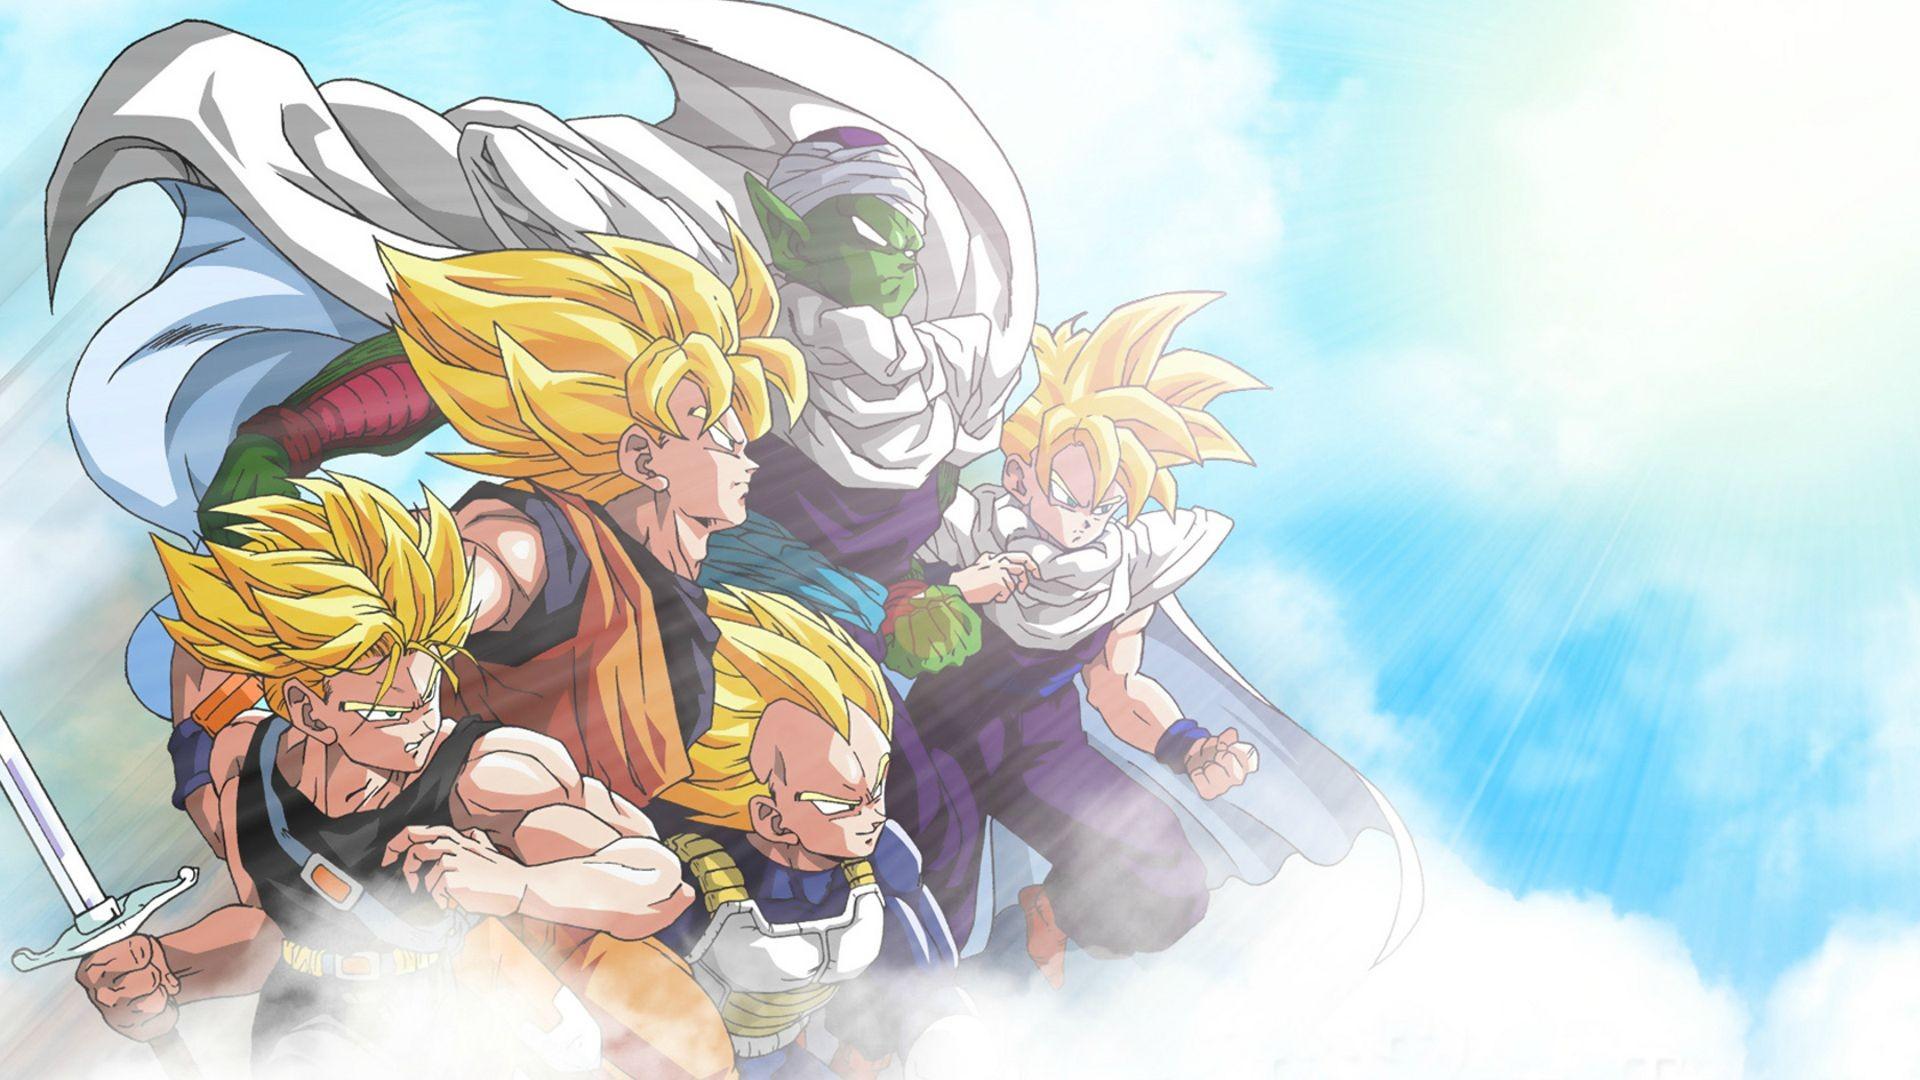 wallpaper : illustration, anime, cartoon, son goku, gohan, dragon